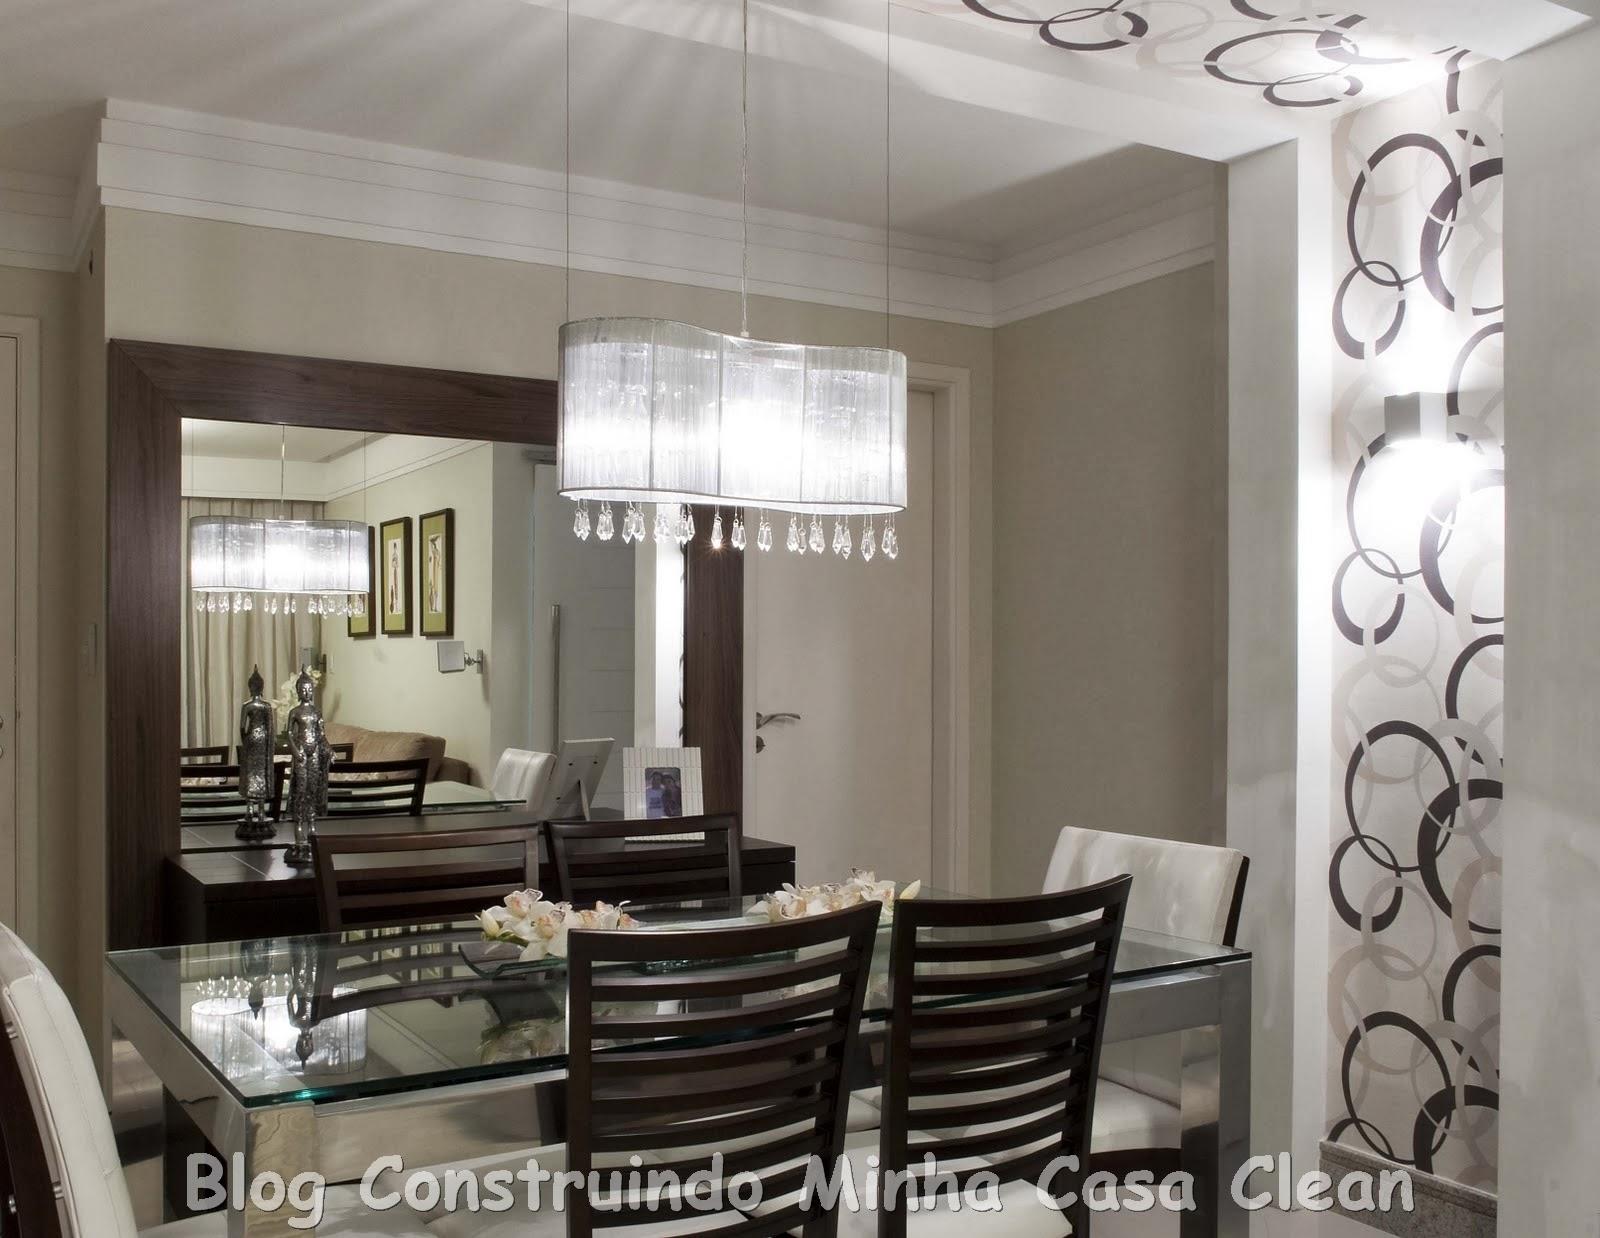 Construindo minha casa clean como decorar a sala de jantar for Como decorar c